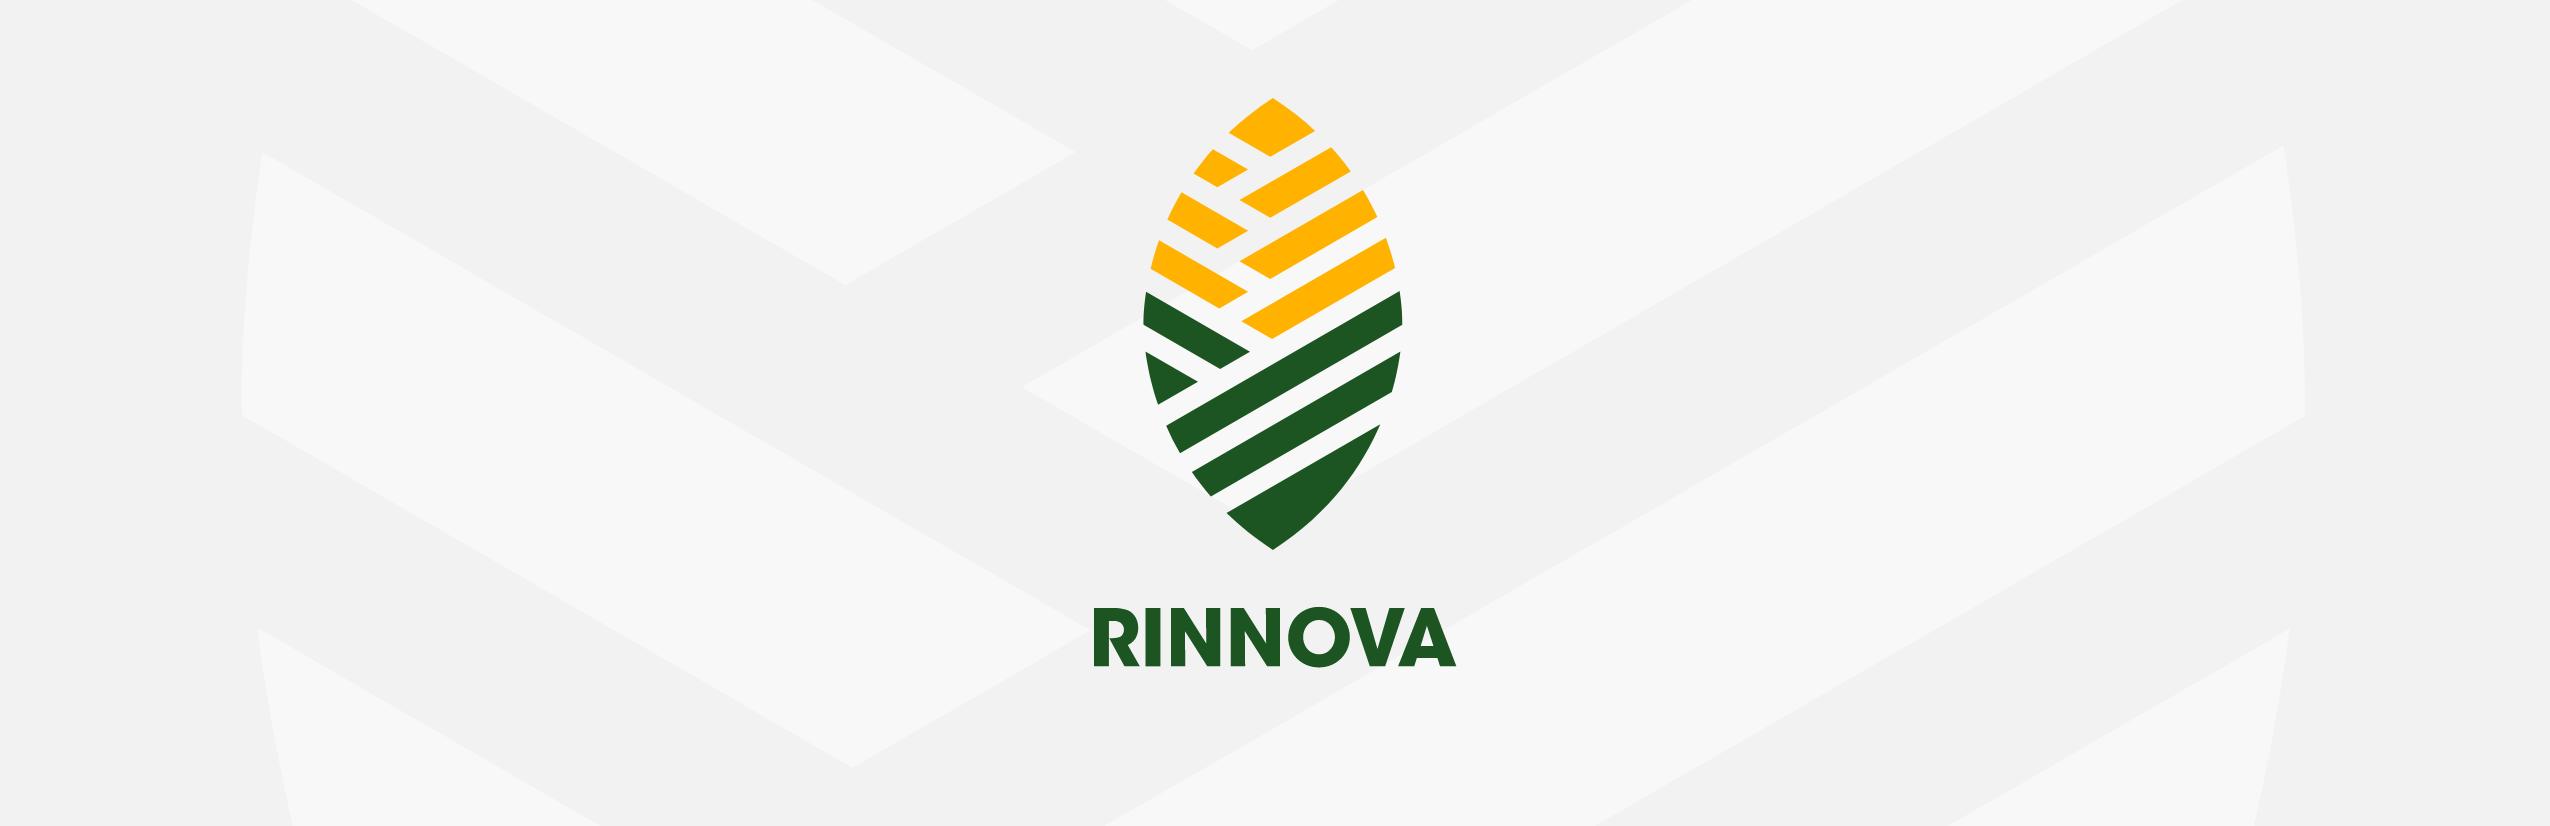 fiscatech-rinnova-logo